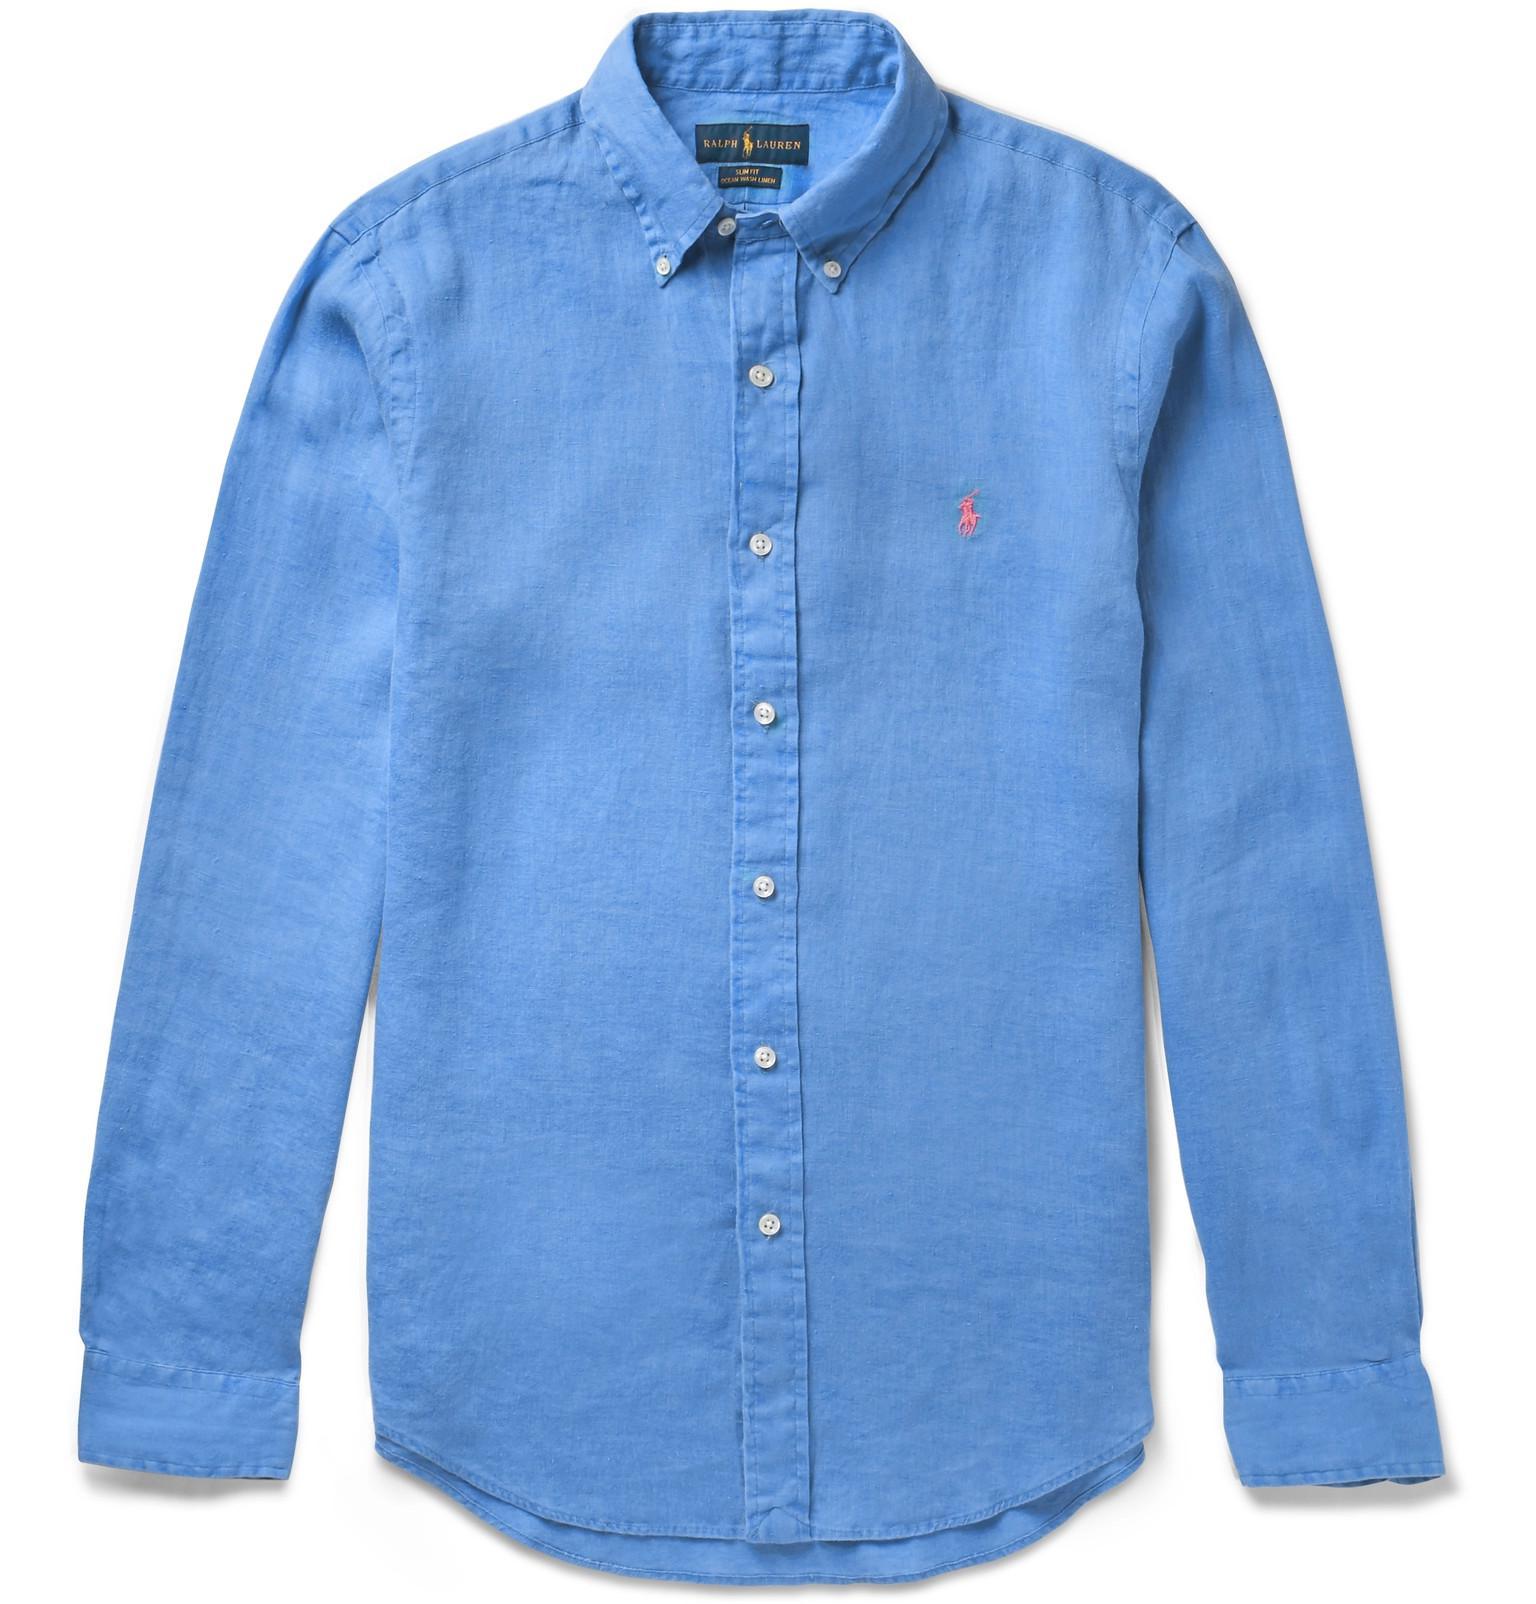 Lyst polo ralph lauren slim fit button down collar linen for Polo ralph lauren casual button down shirts